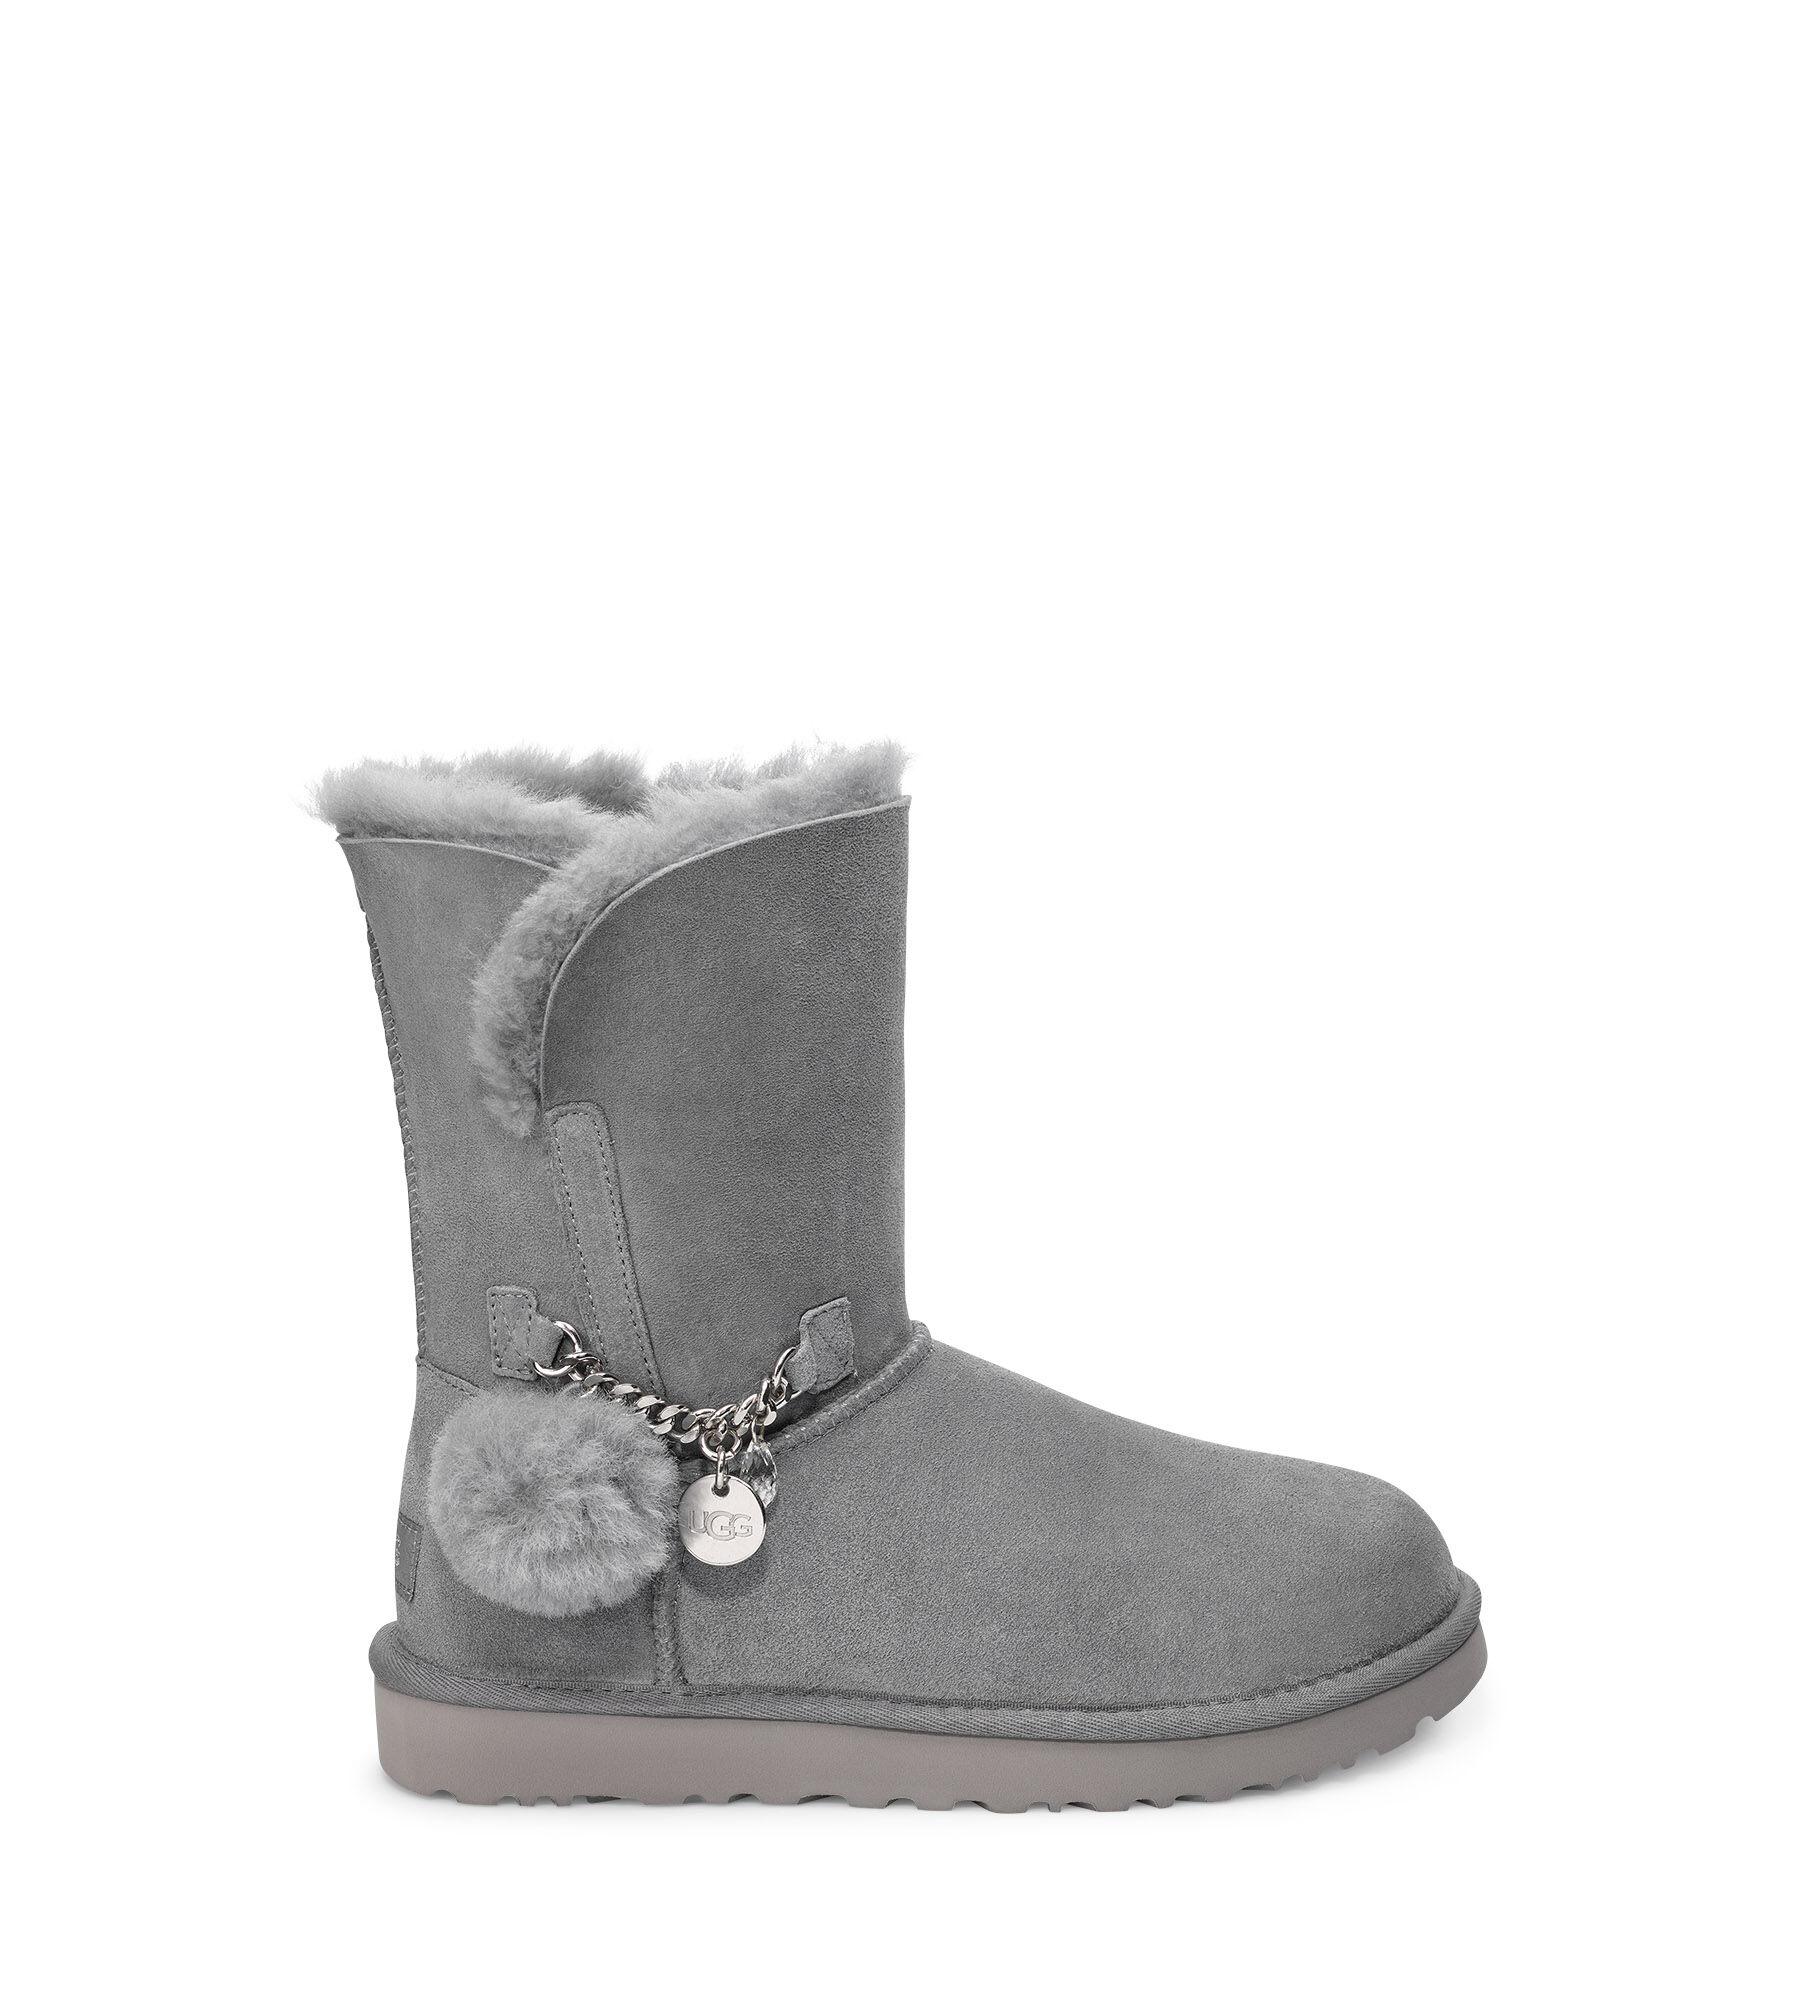 Ugg Halbschuhe Reduziert Online Ugg Lane Metallic Loafer